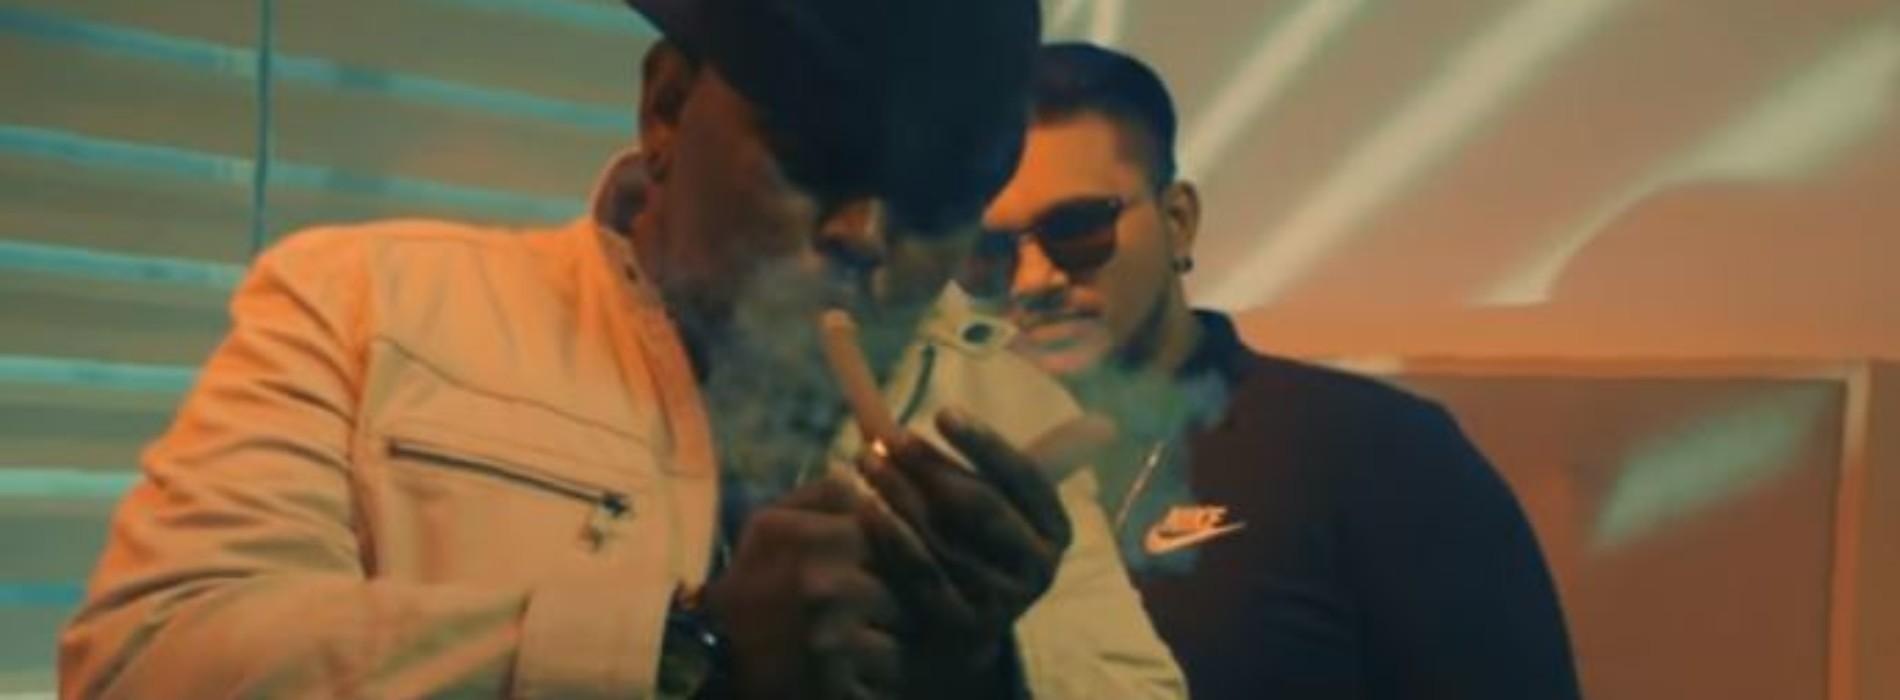 Bone Killa Feat. Rabbit Mac – Thamizhan Dance (Official Music Video)